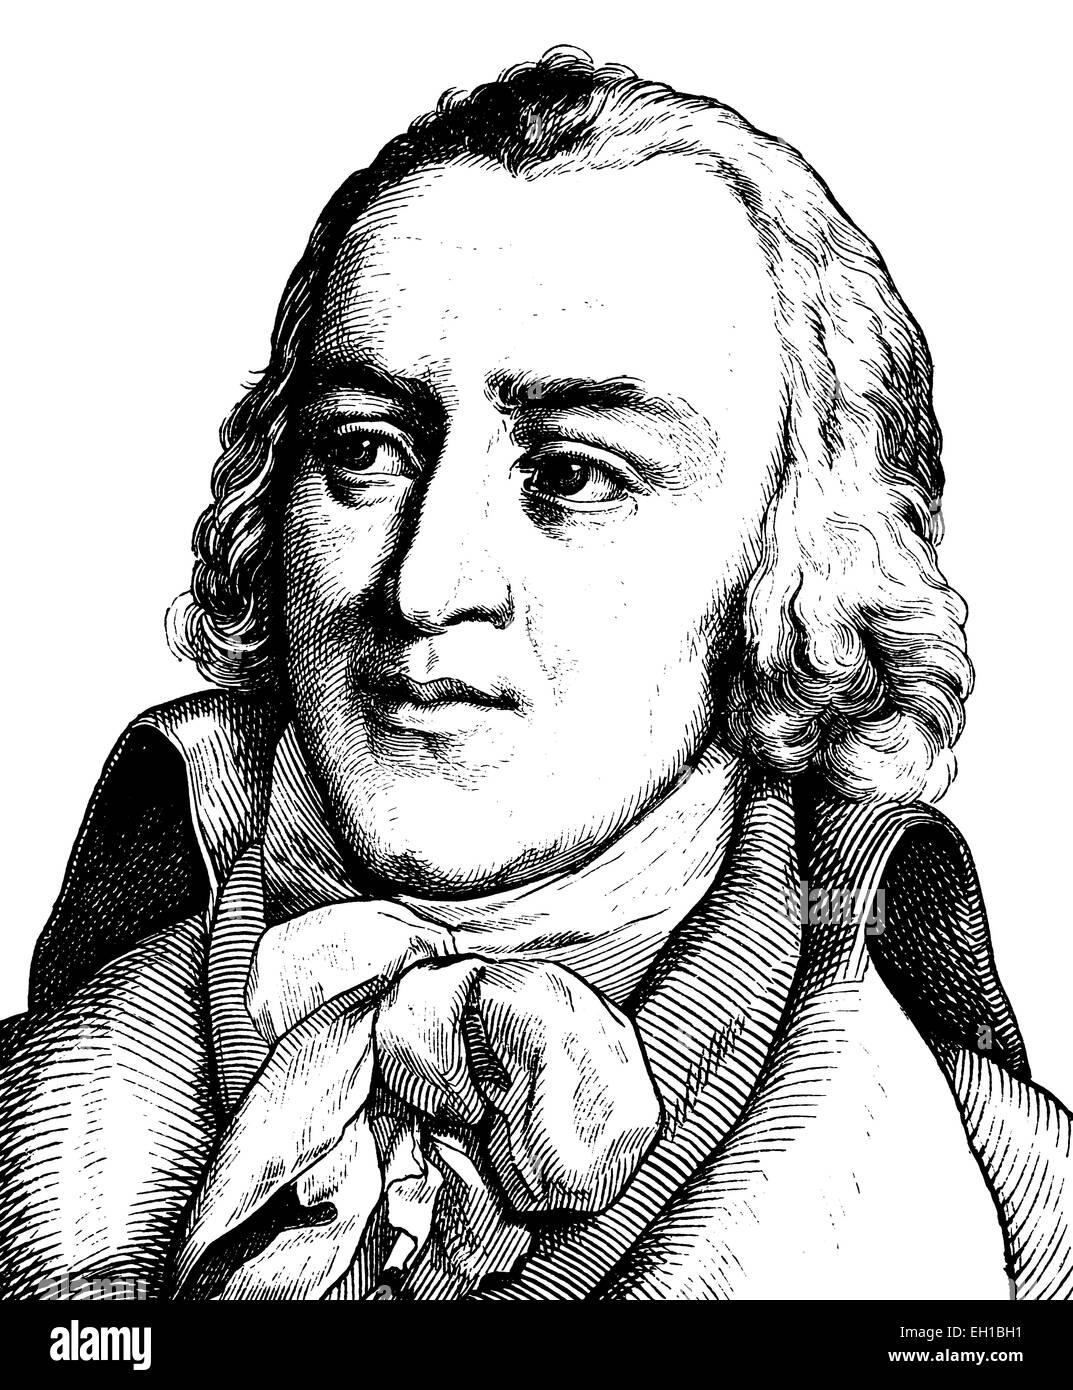 Digital improved image of Friedrich von Matthisson, 1761-1831, lyric poet, lyricist and prose writer - Stock Image